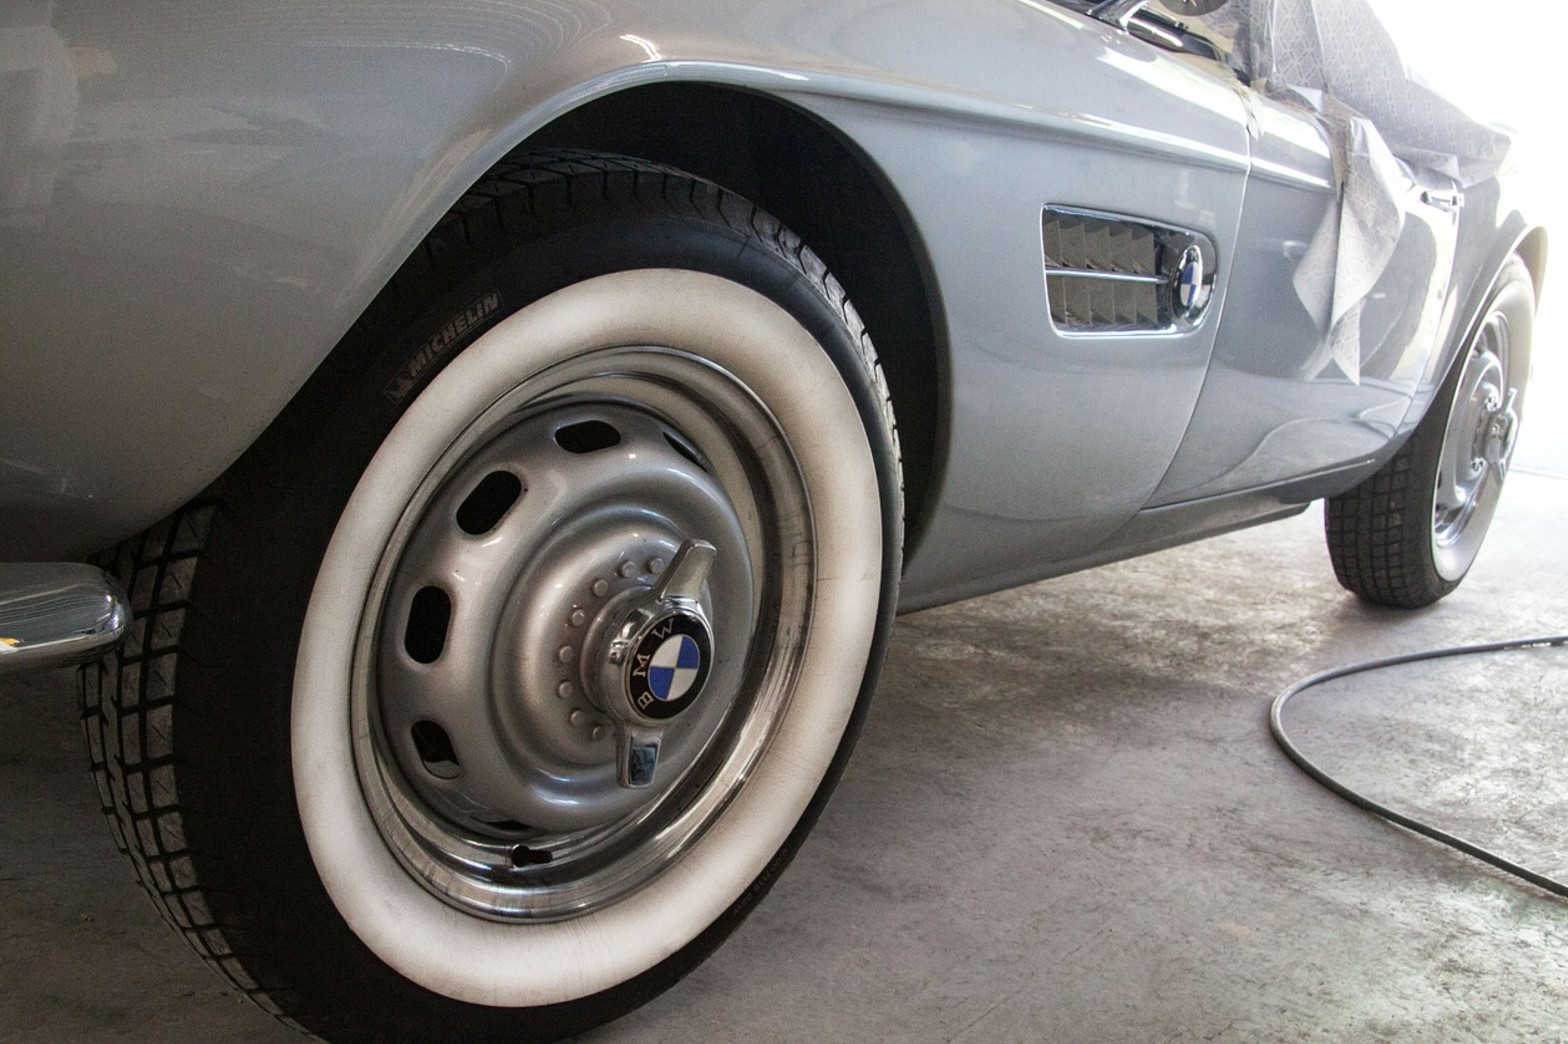 BMW・MINI専門の板金塗装サービス開始のお知らせ